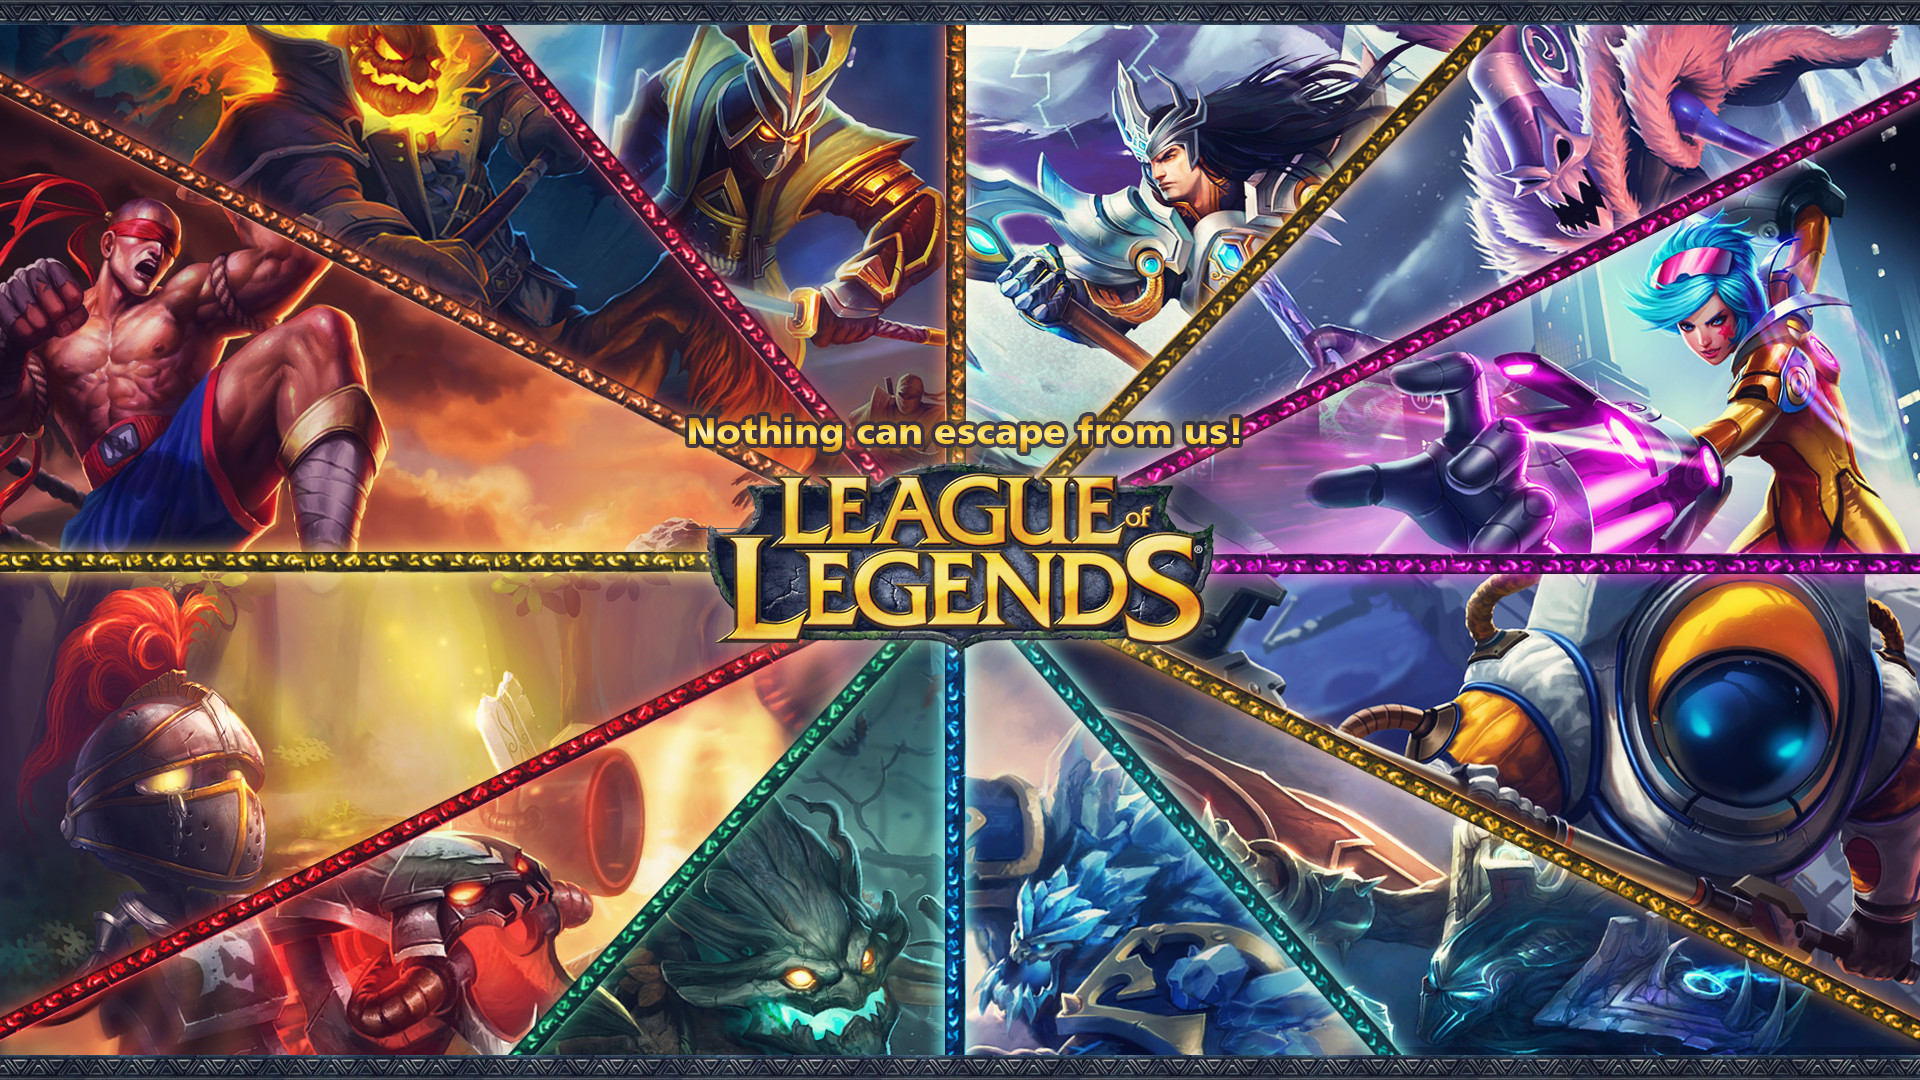 … League of Legends Jungle Kit wallpaper by Utitake